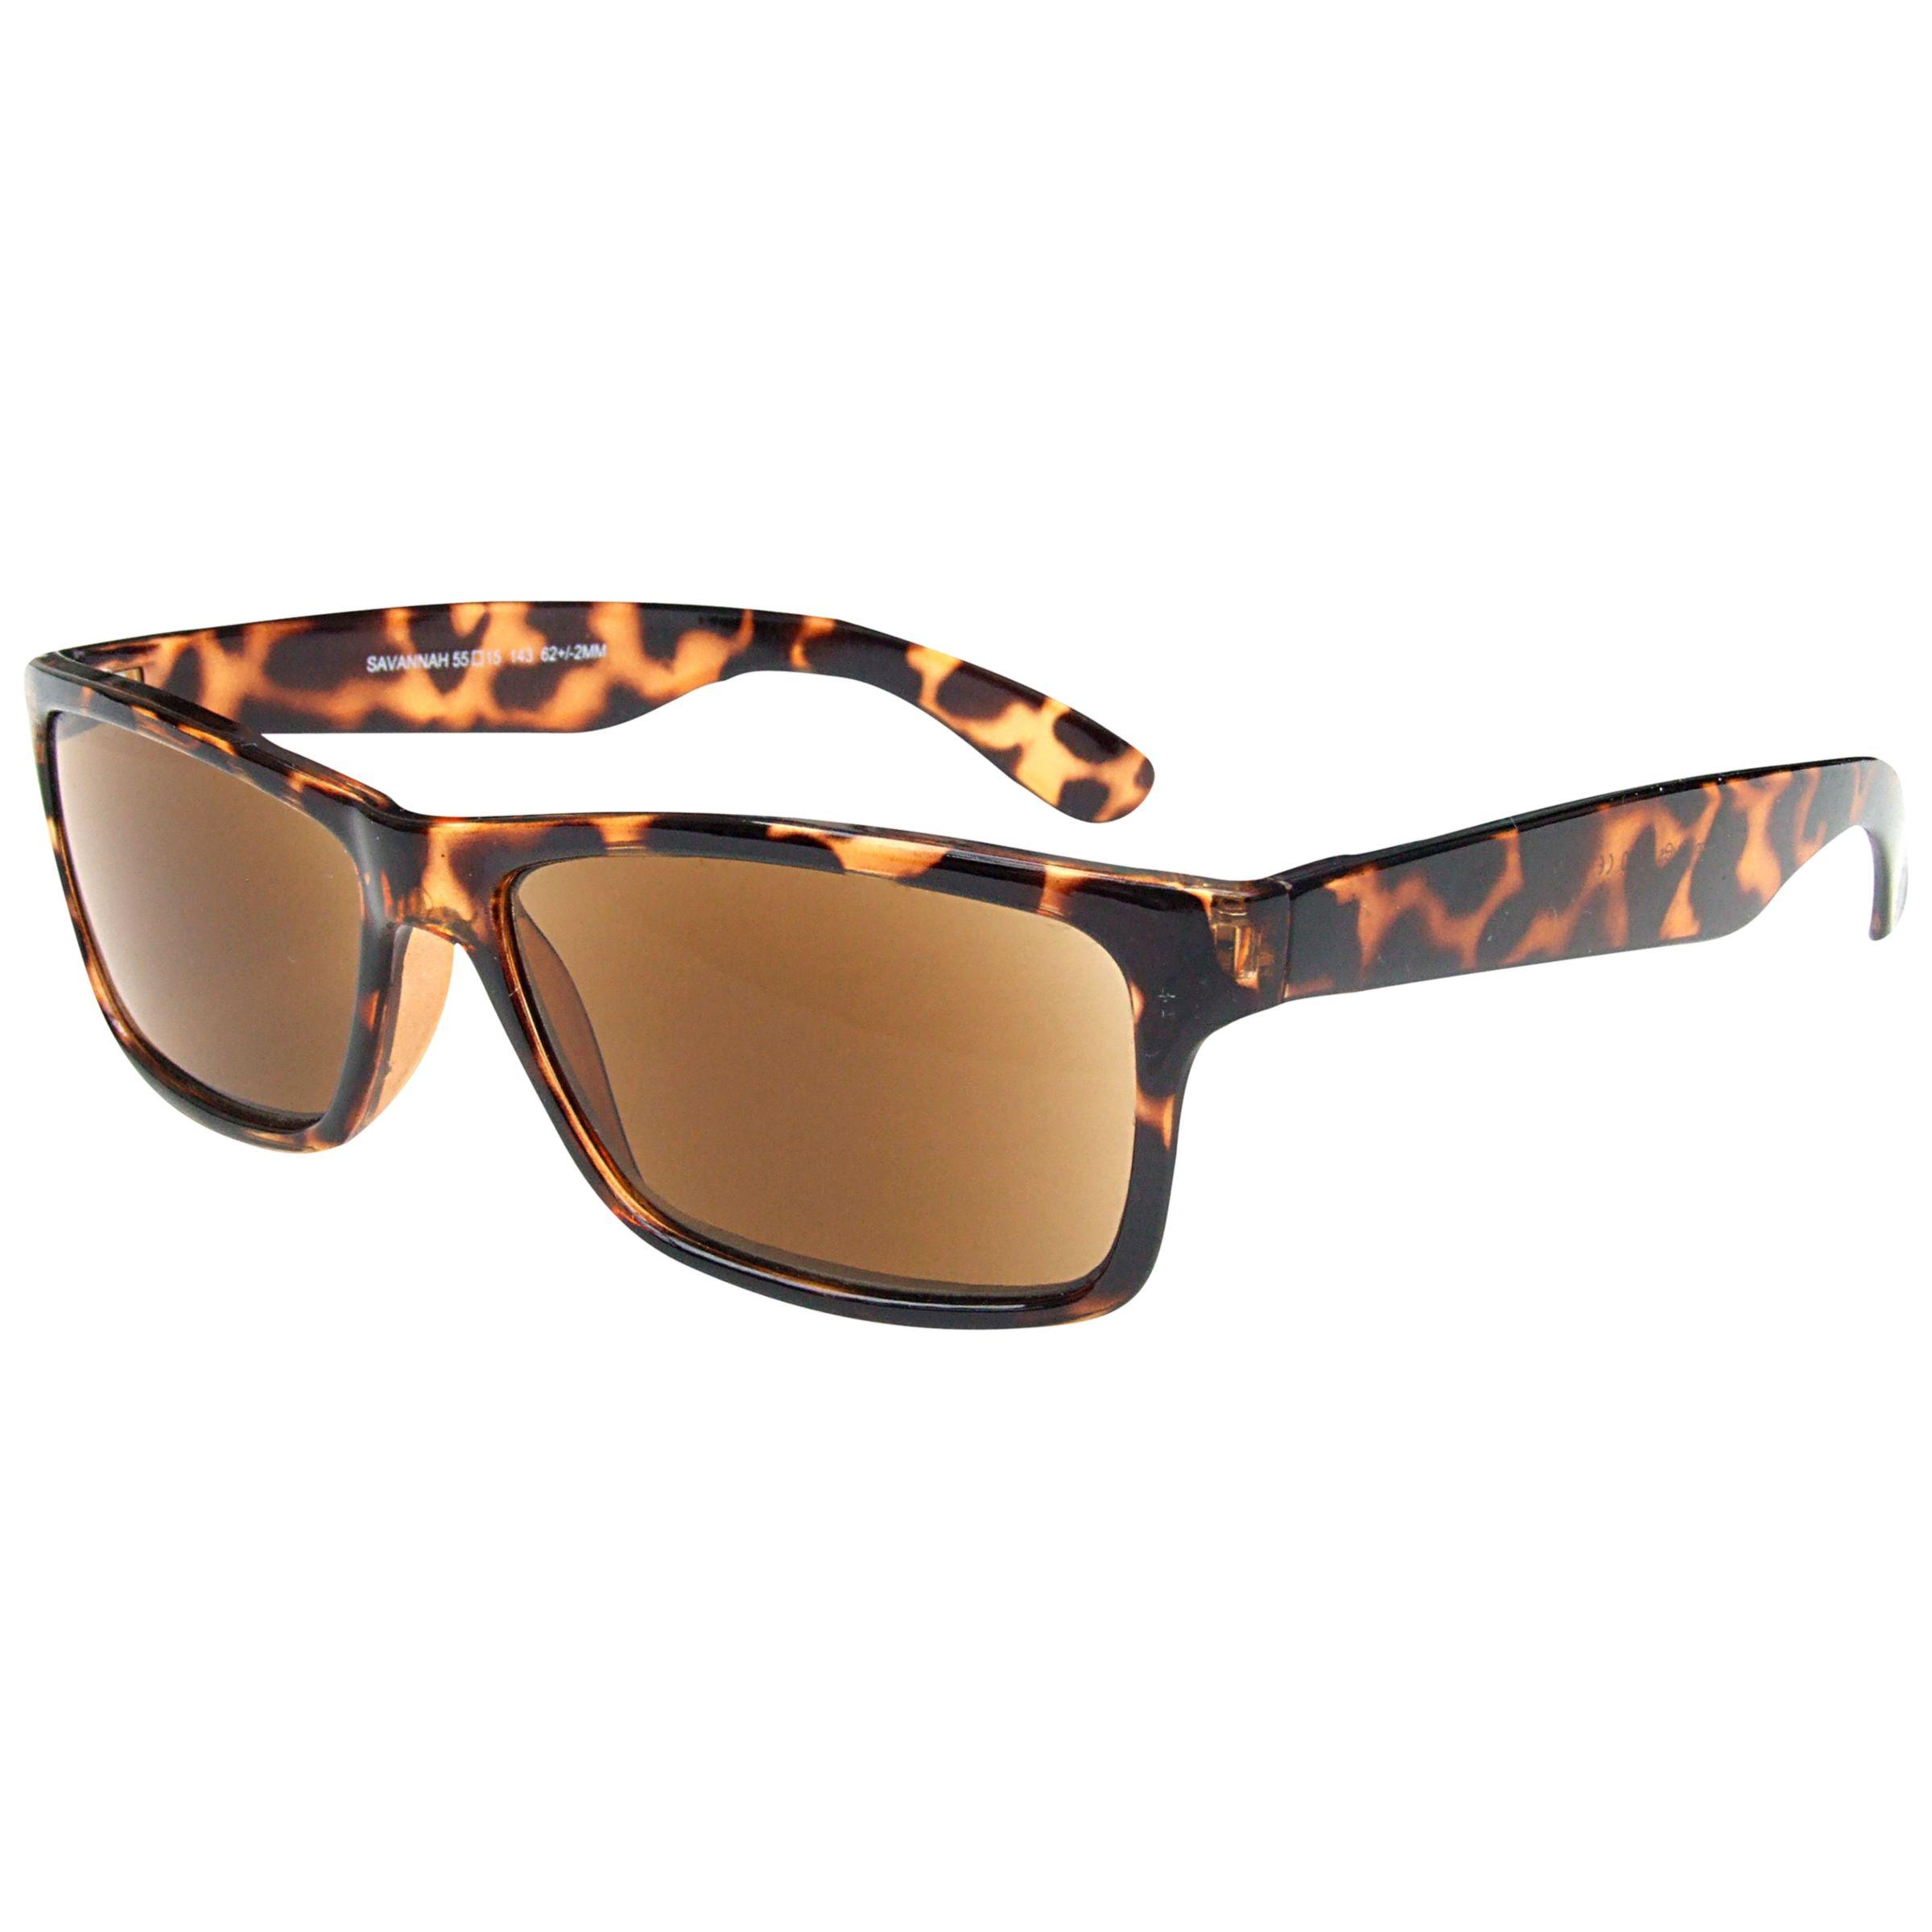 Magnif Eyes Magnif Eyes Savannah Unisex Ready Reader Sunglasses, Shell